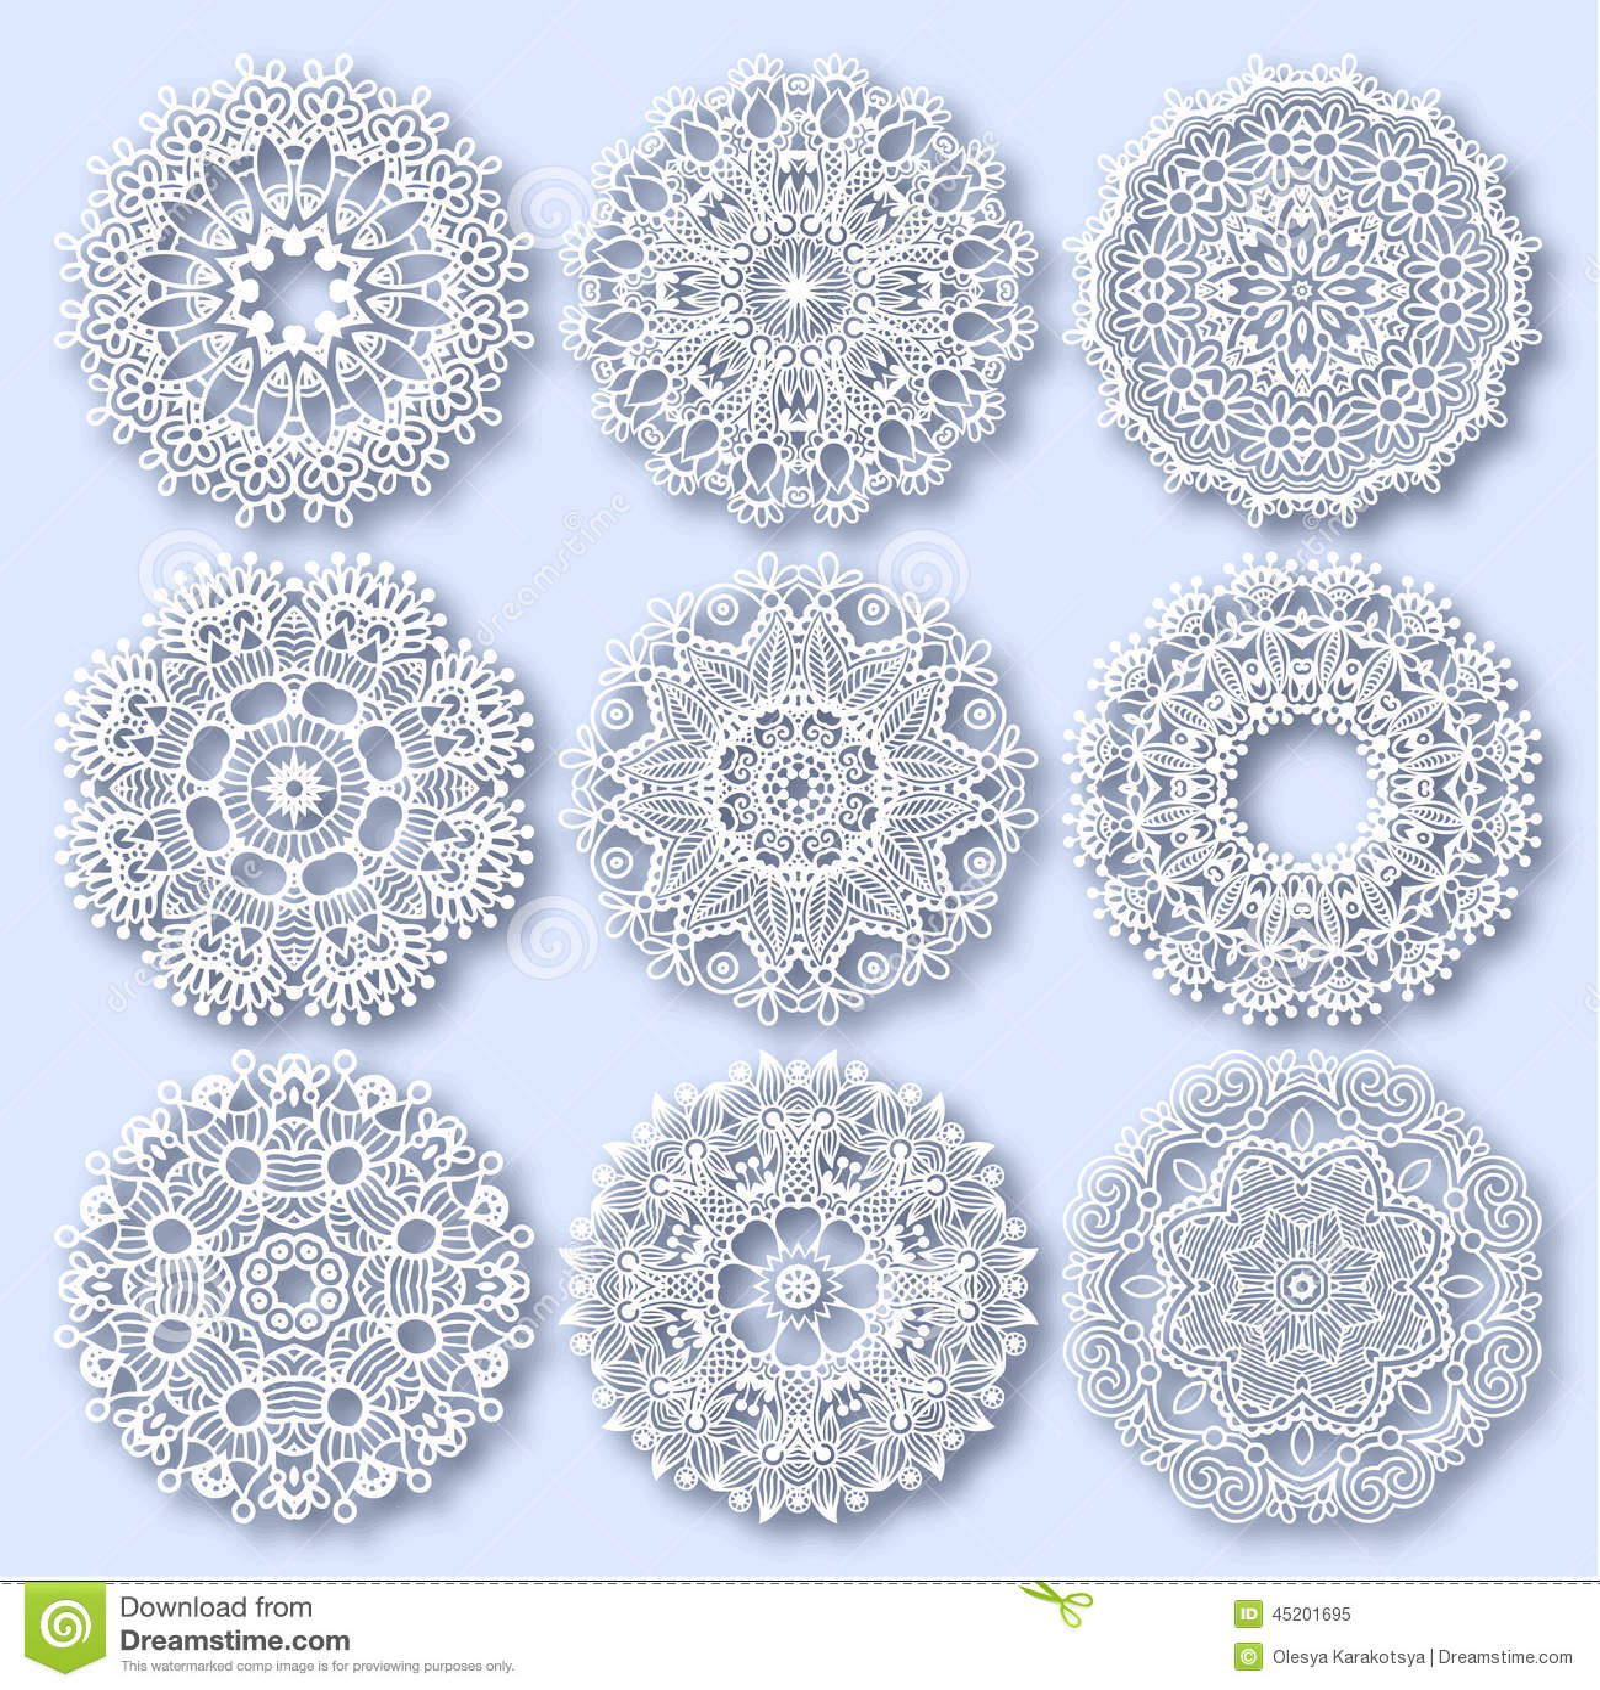 Circle lace ornament, round ornamental geometric